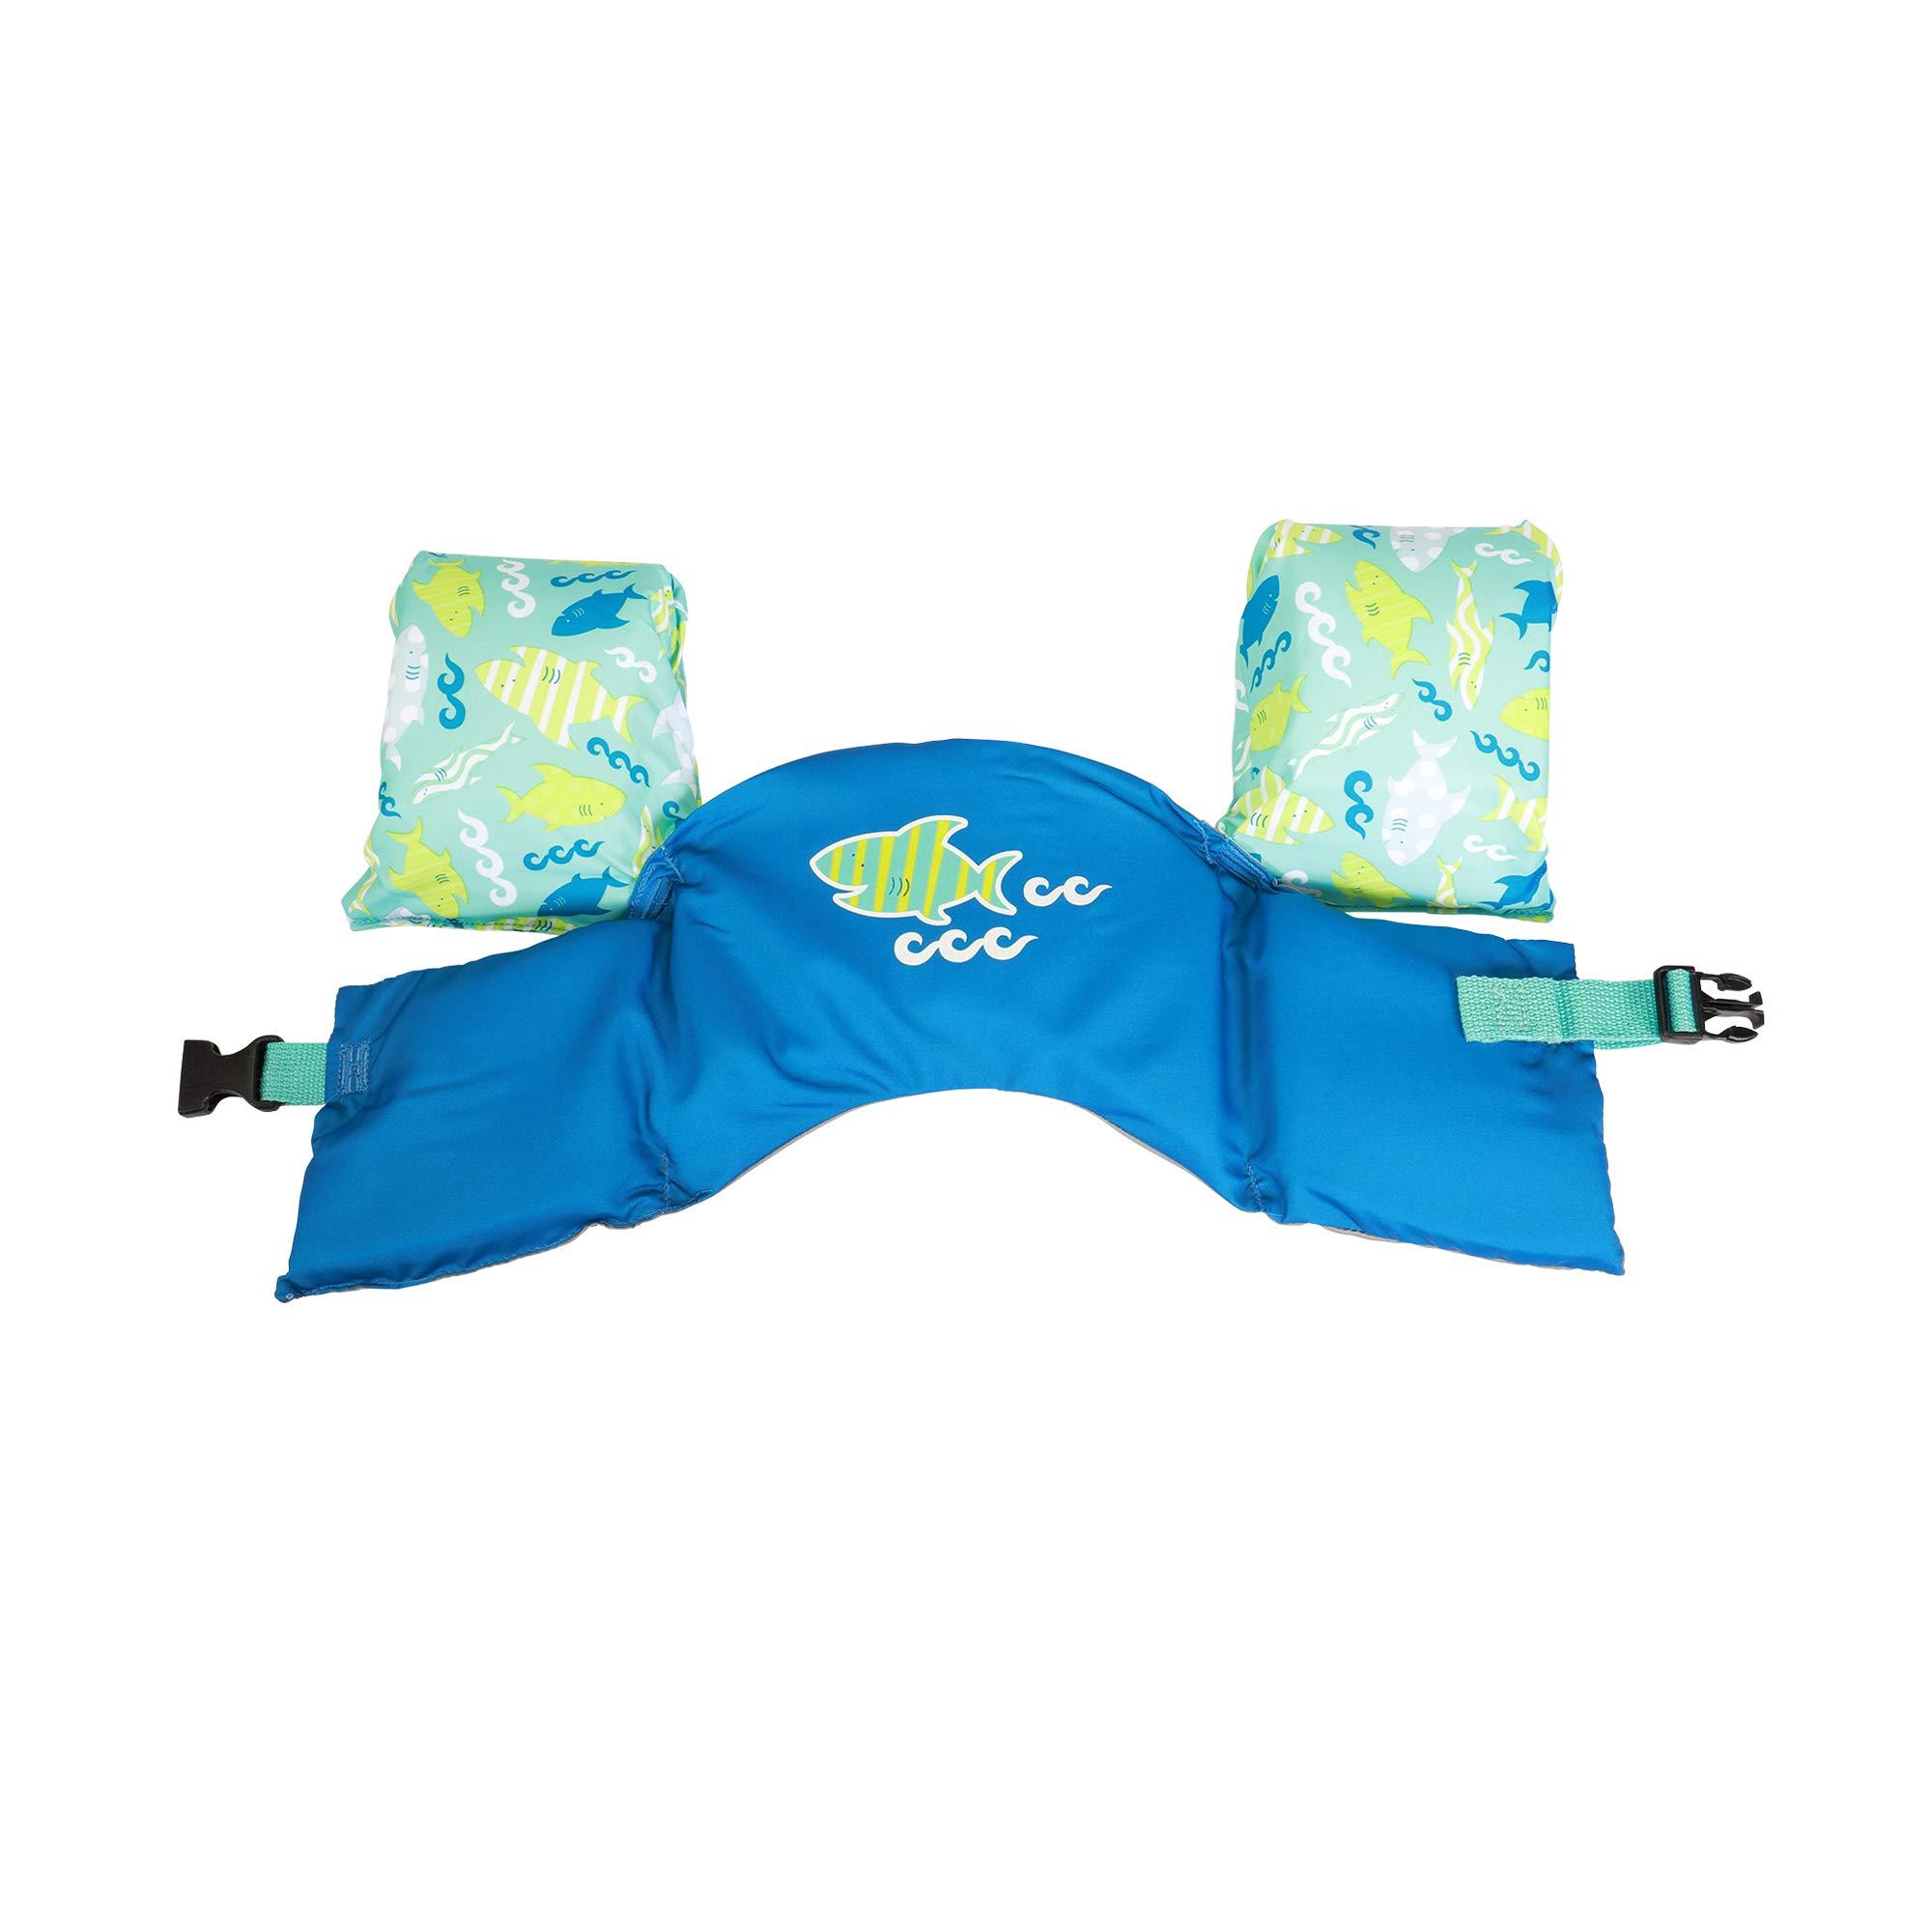 SwimWays Sea Squirts Swim Trainer Life Jacket - Blue Shark product image